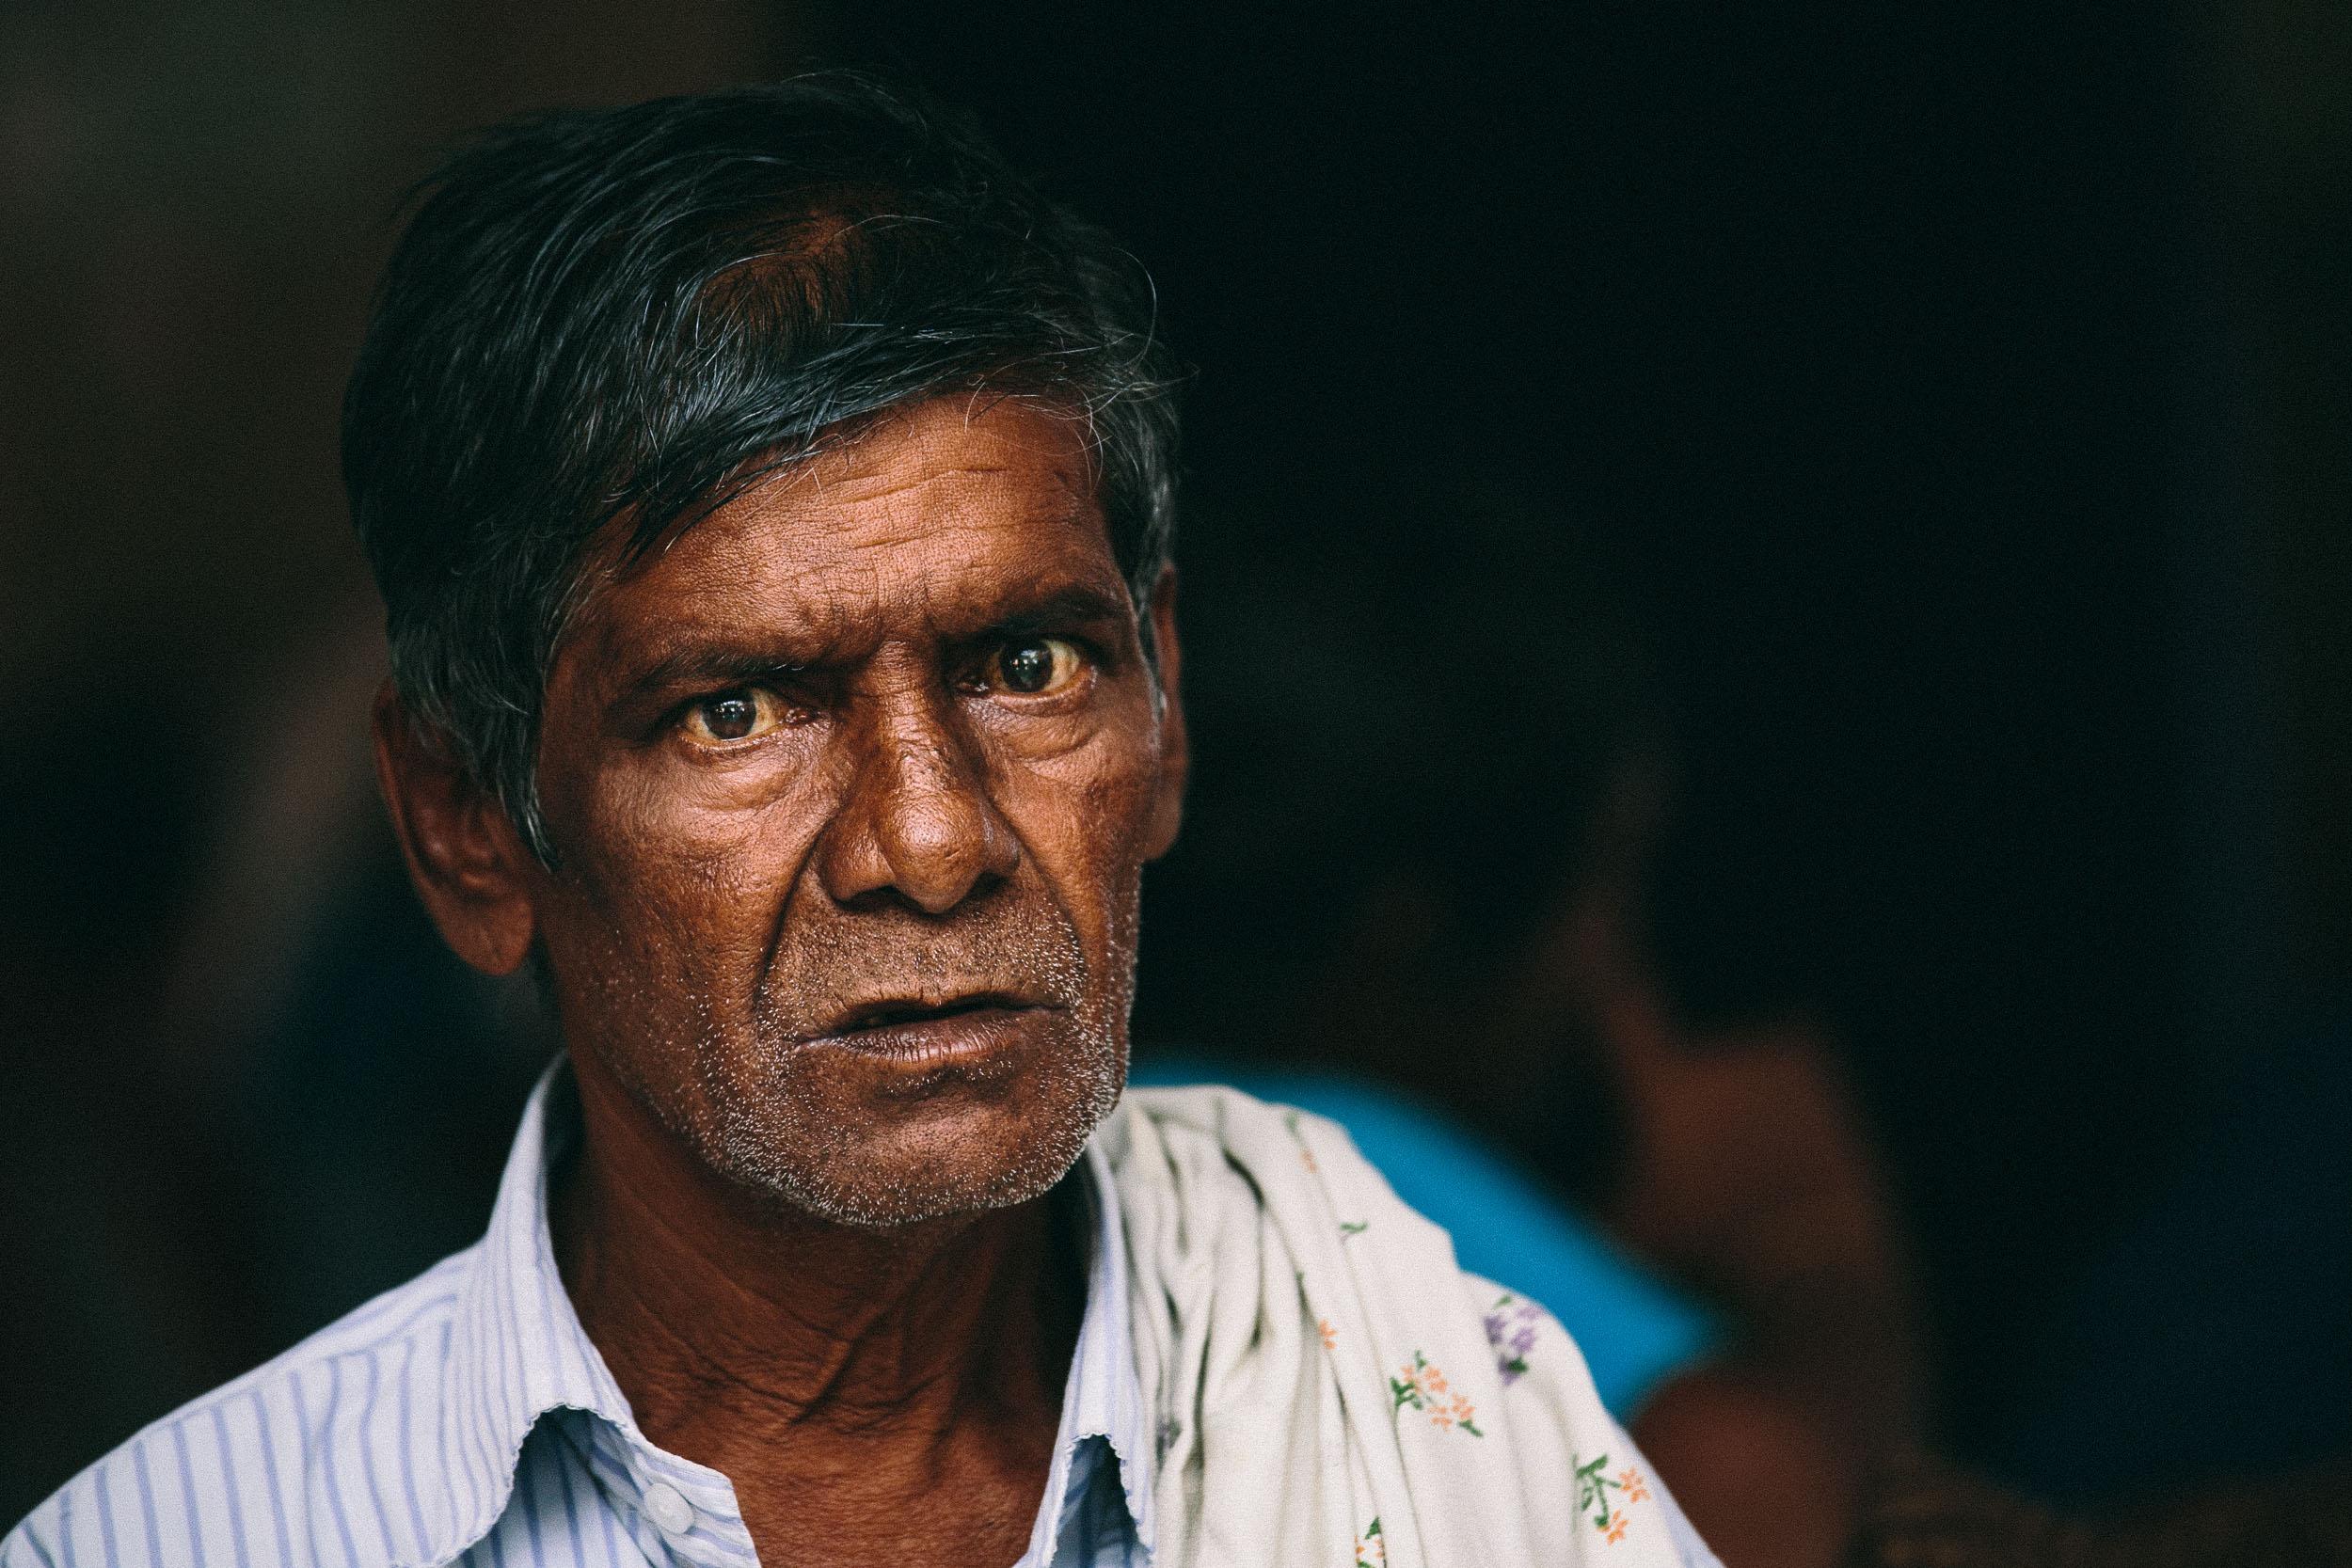 brian-callaway-india-photography-aravind-eye-hospital-23.jpg